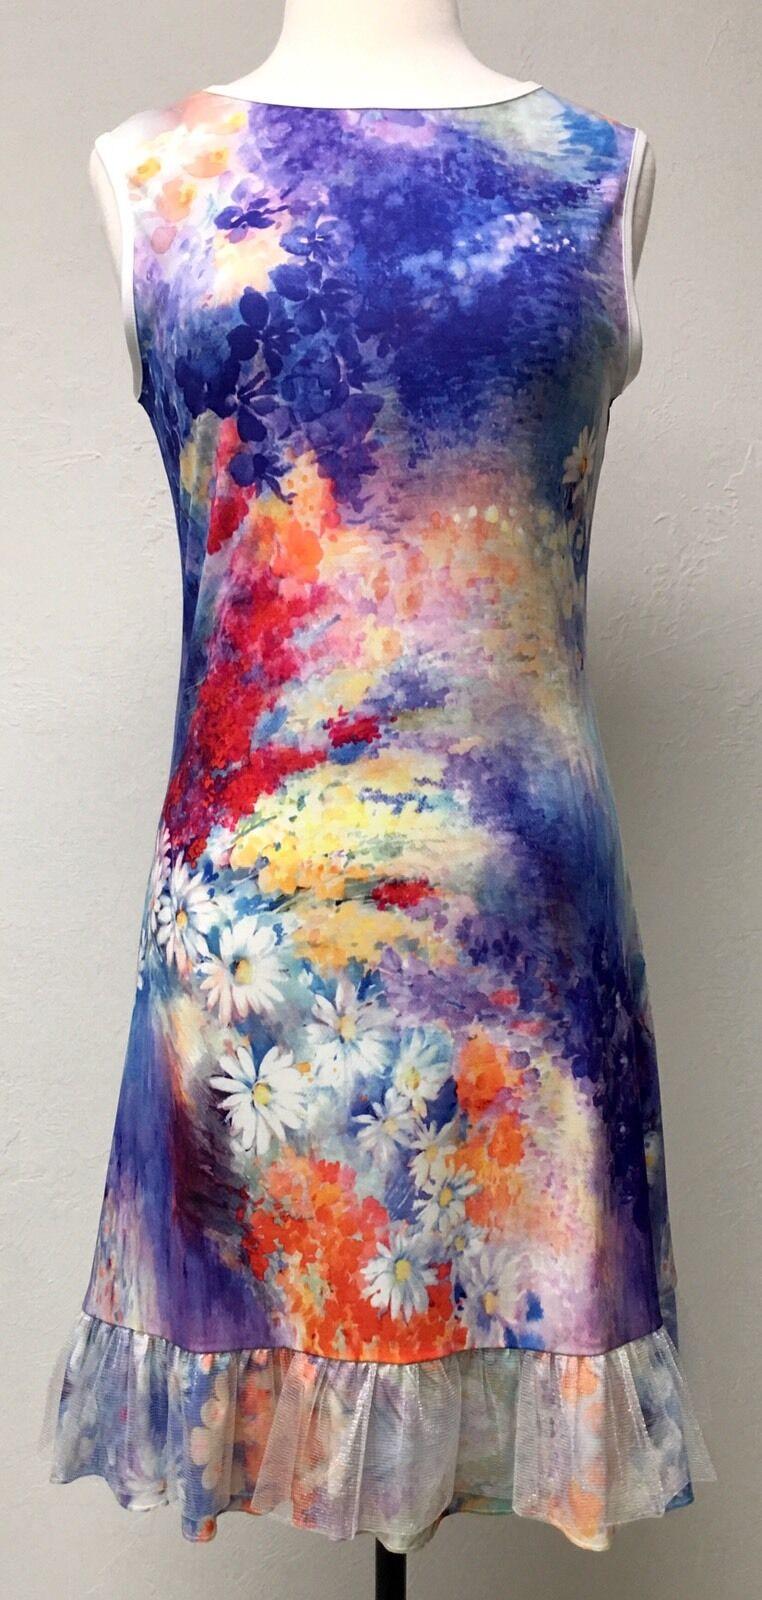 Vintage Concept Designer Boutique Sleeveless Floral Painting Shift Dress Size S